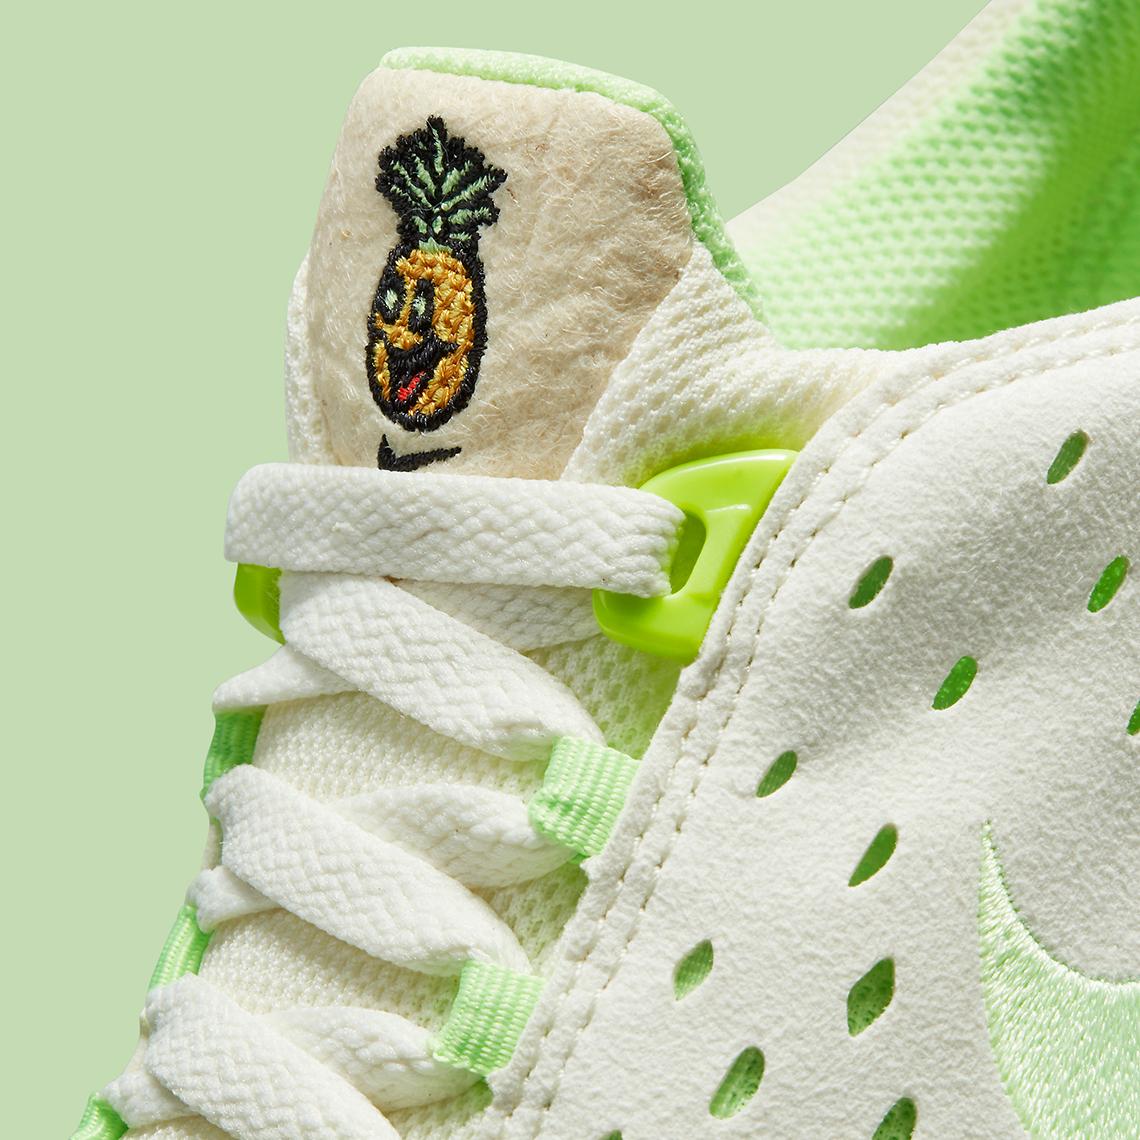 Nike-Free-Run-Trail-CZ9079-100-8.jpg?w=1140